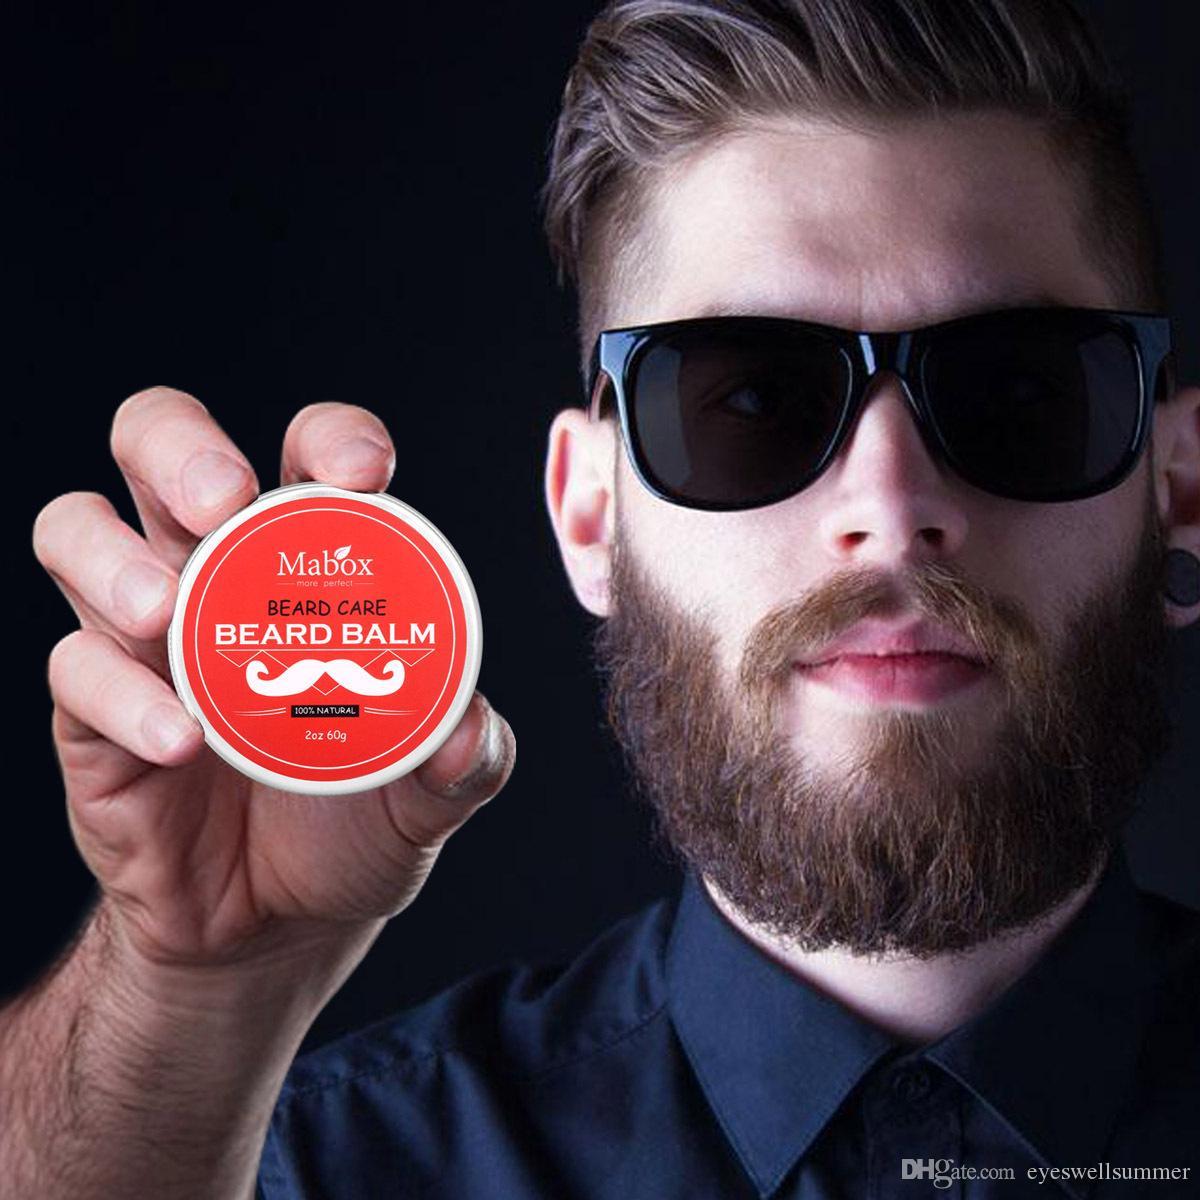 Mabox Beard Oil & Balm Moustache Wax Beard Grooming Conditioner لحية بلسم للتصفيف والترطيب